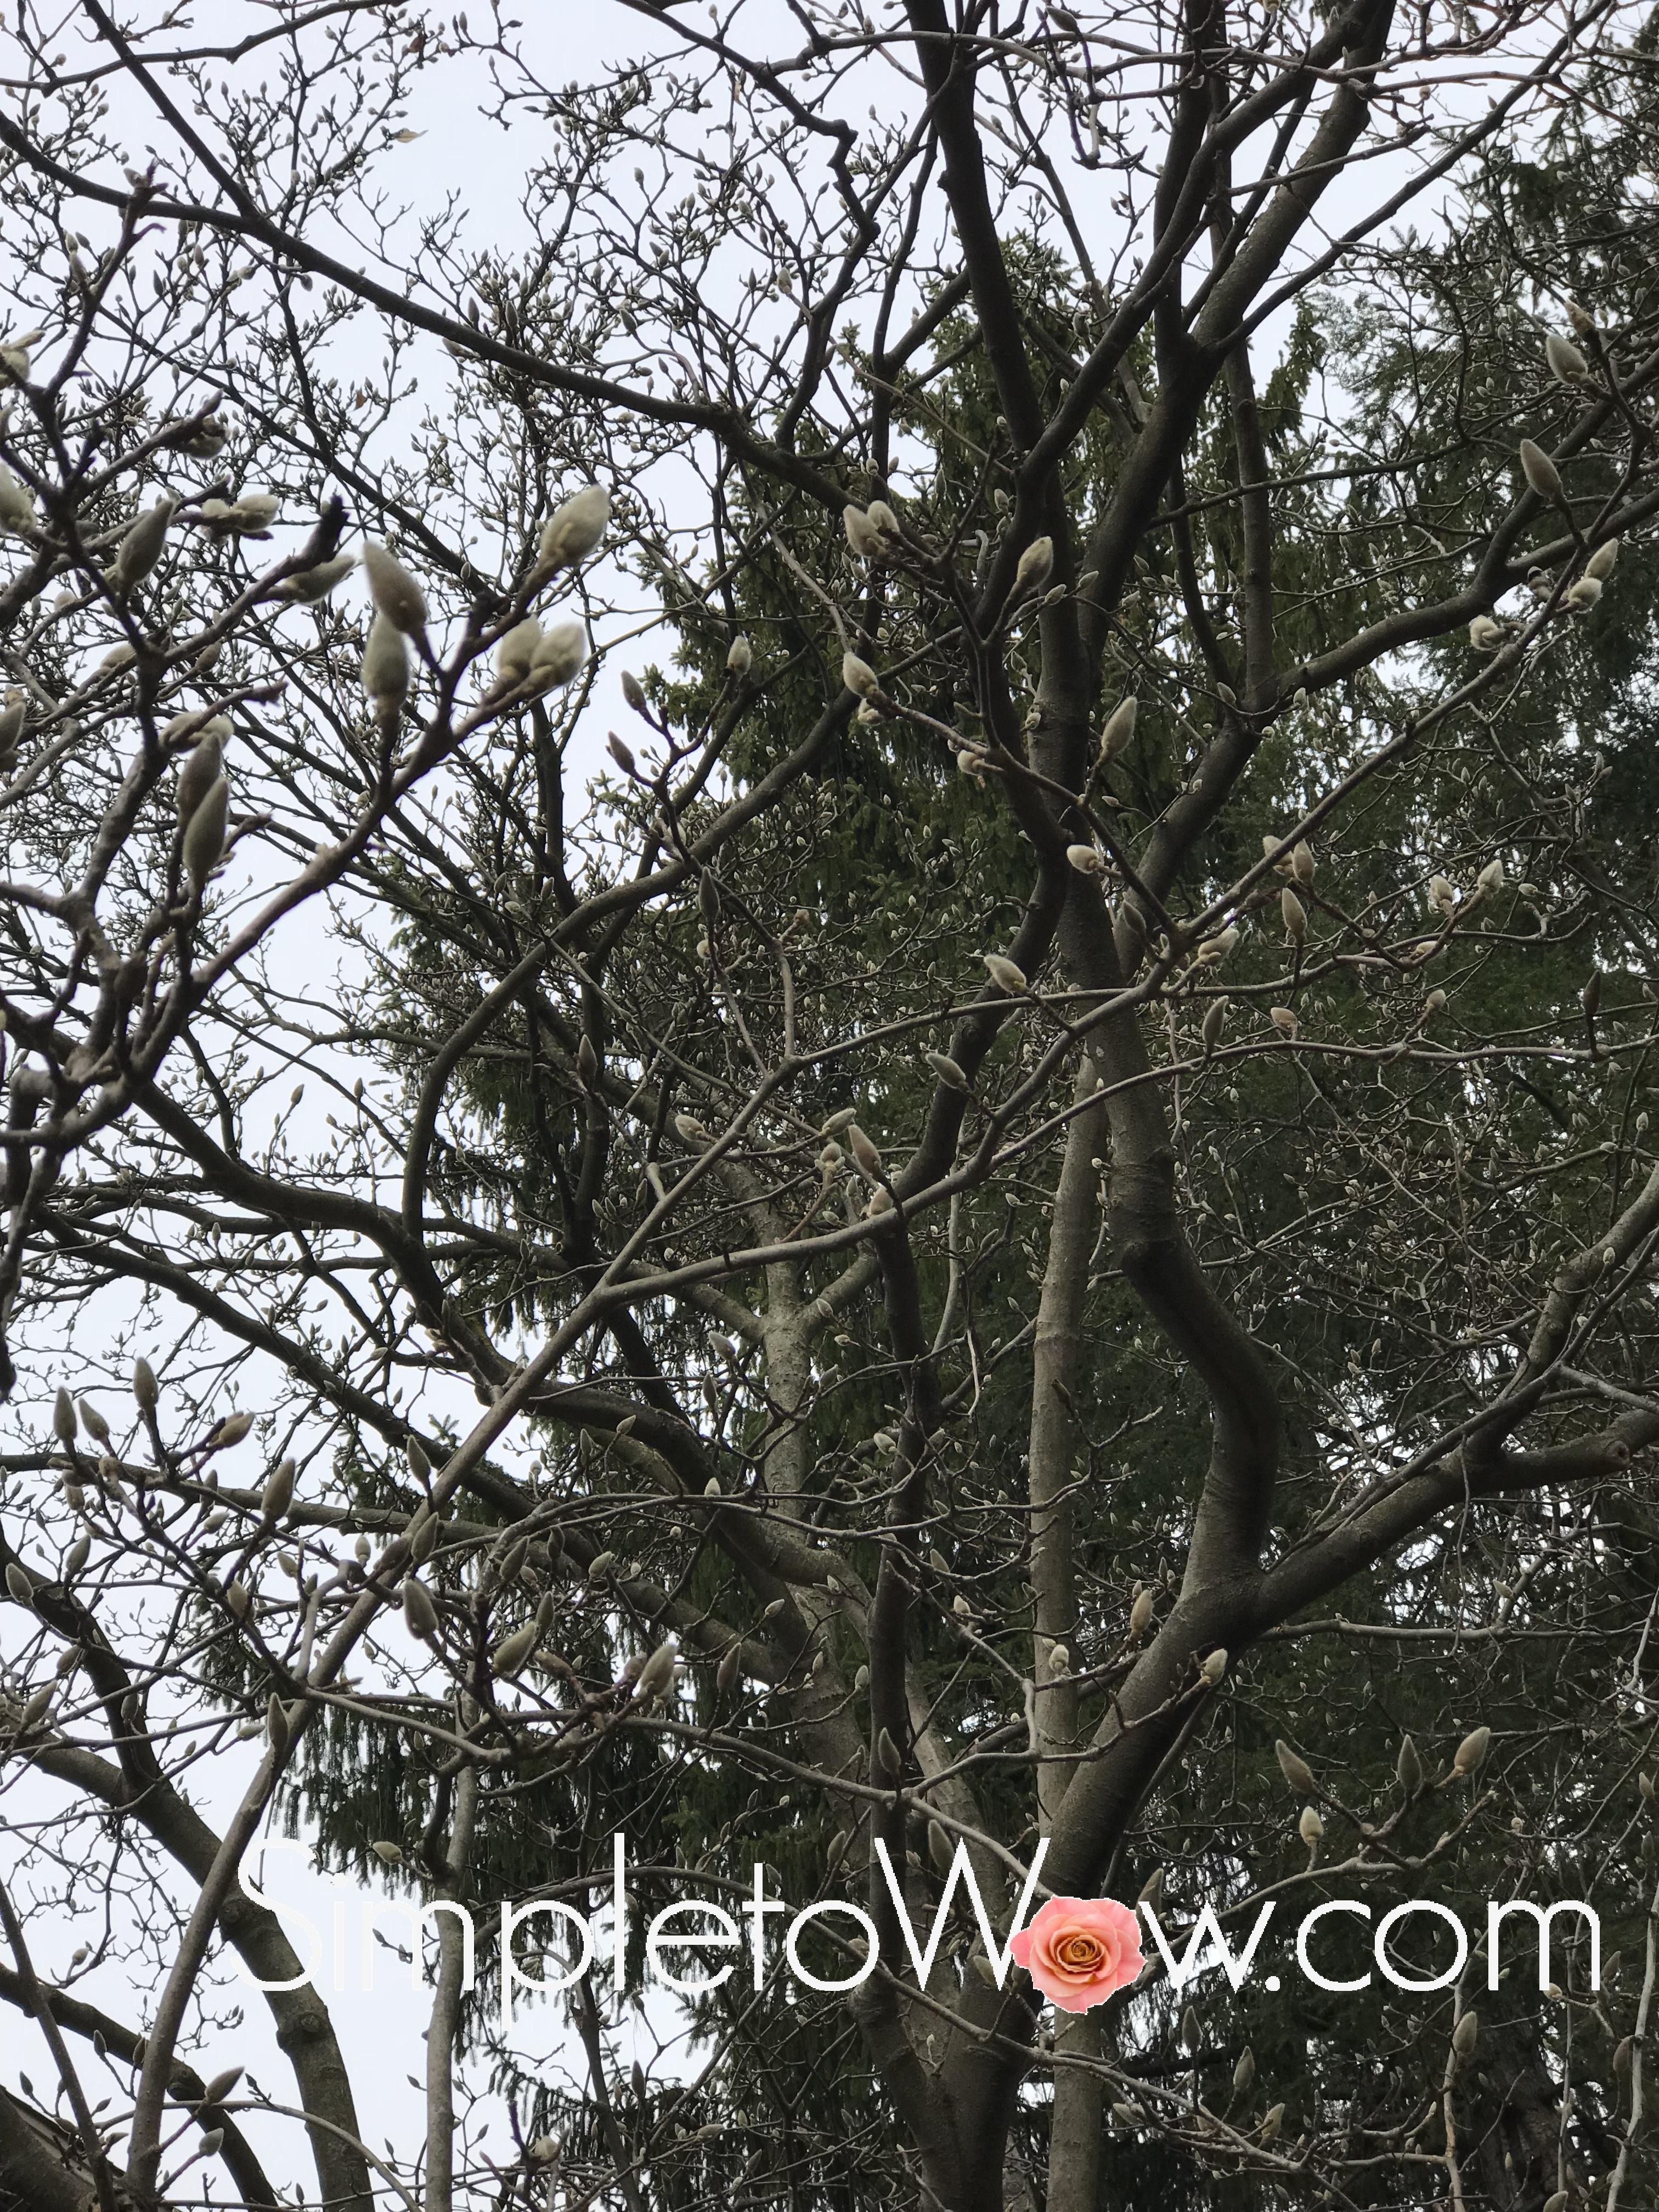 magnolia tree in february.jpg